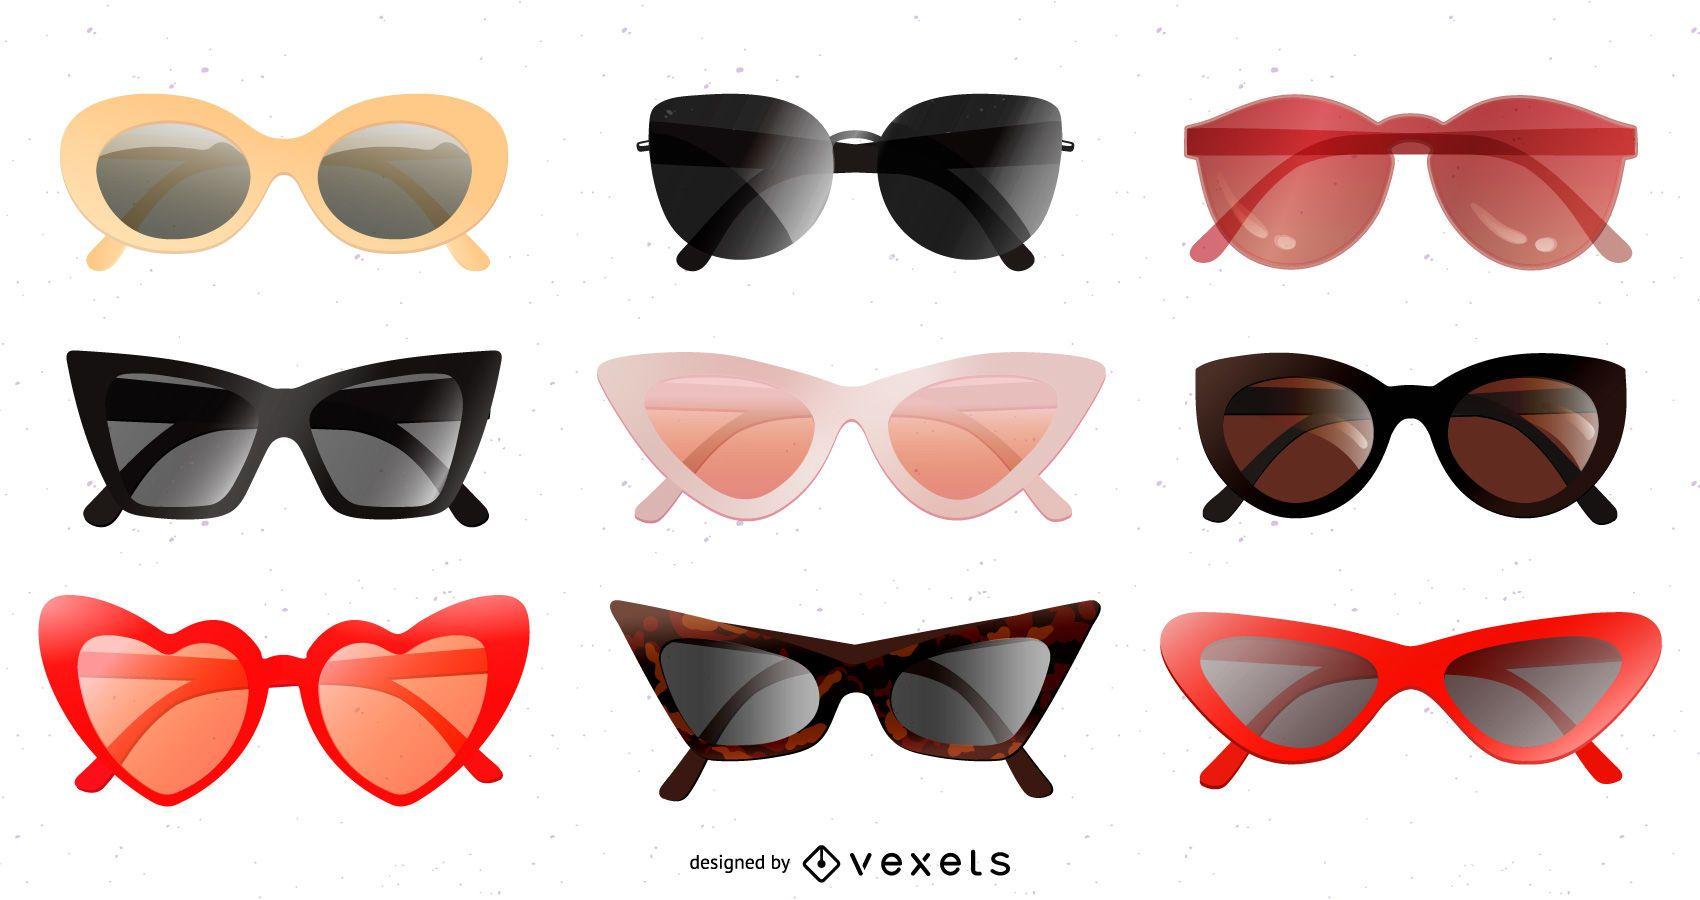 Glossy Sunglasses Design Pack